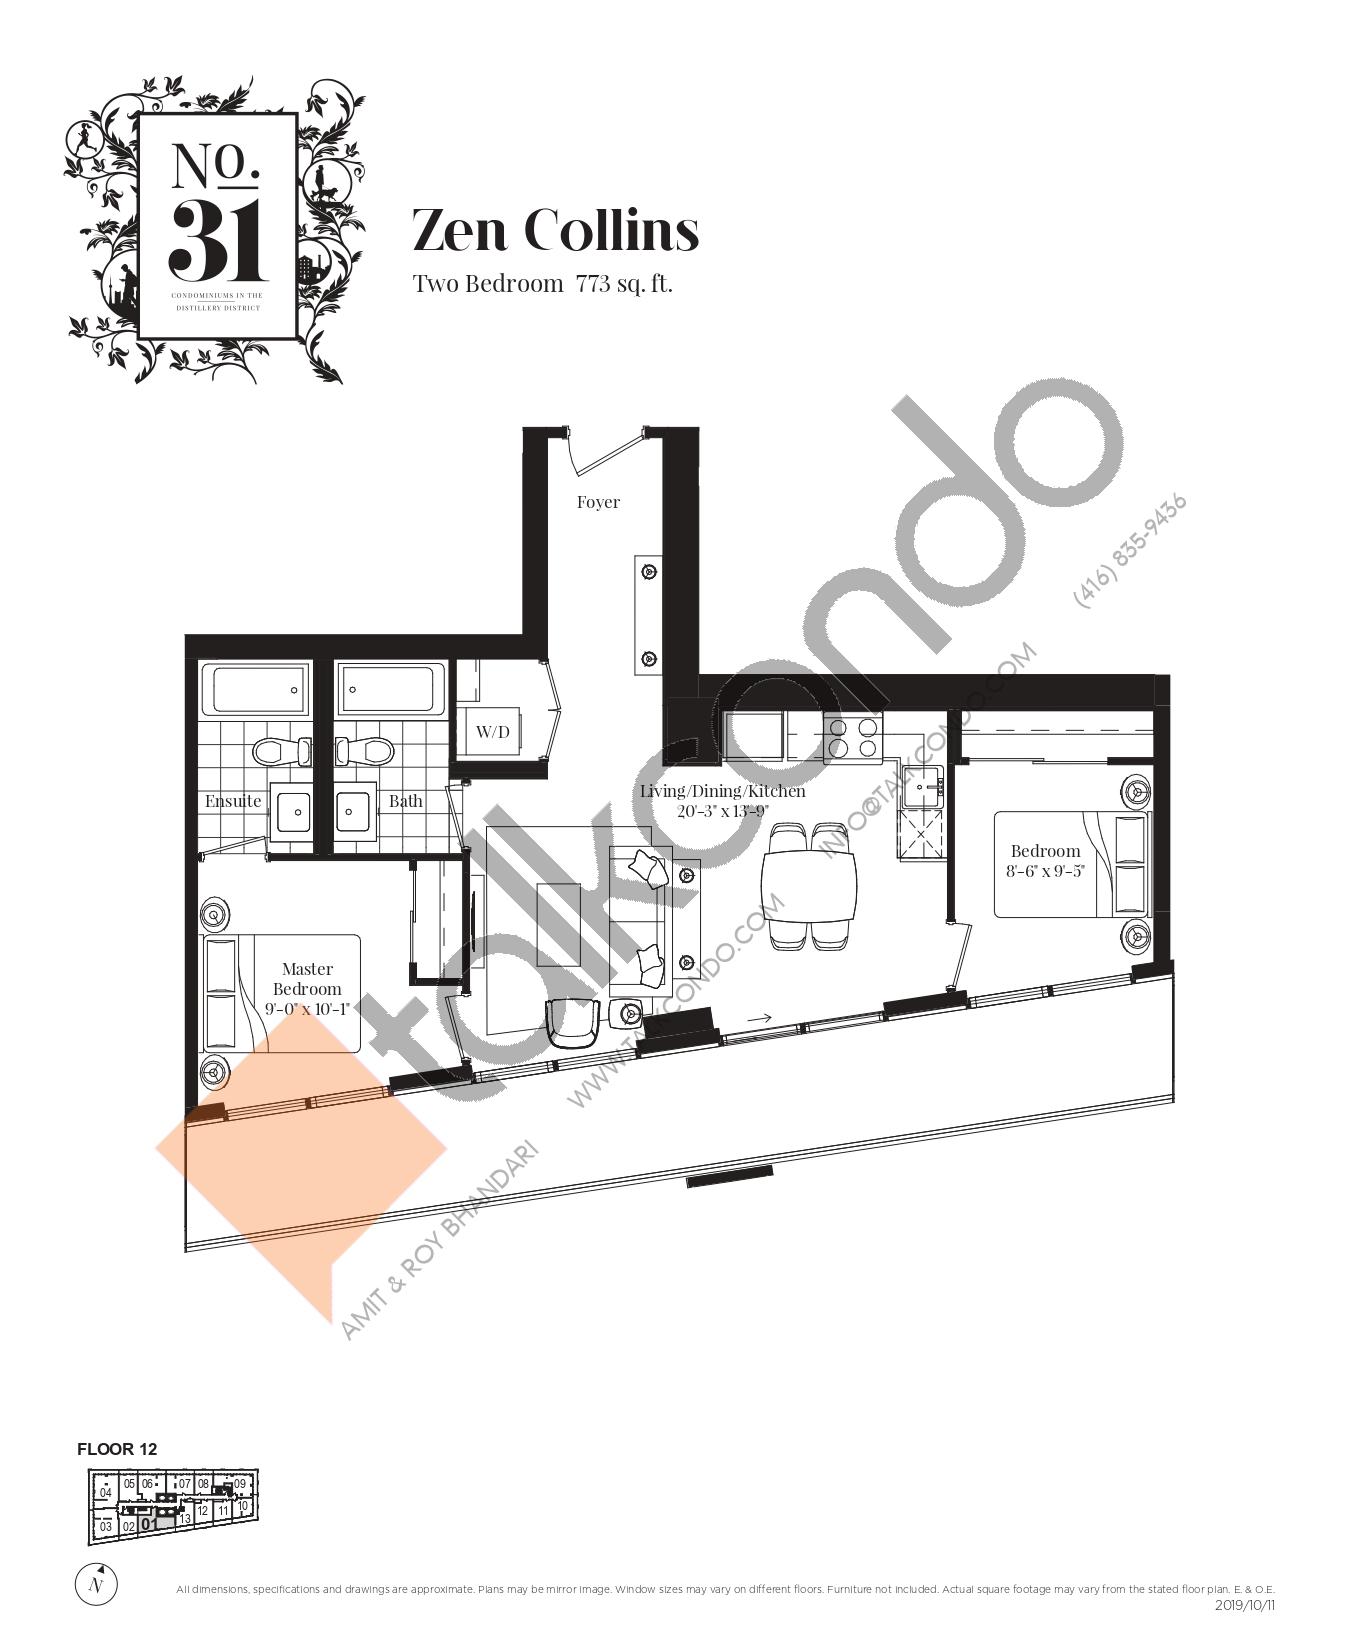 Zen Collins Floor Plan at No. 31 Condos - 773 sq.ft